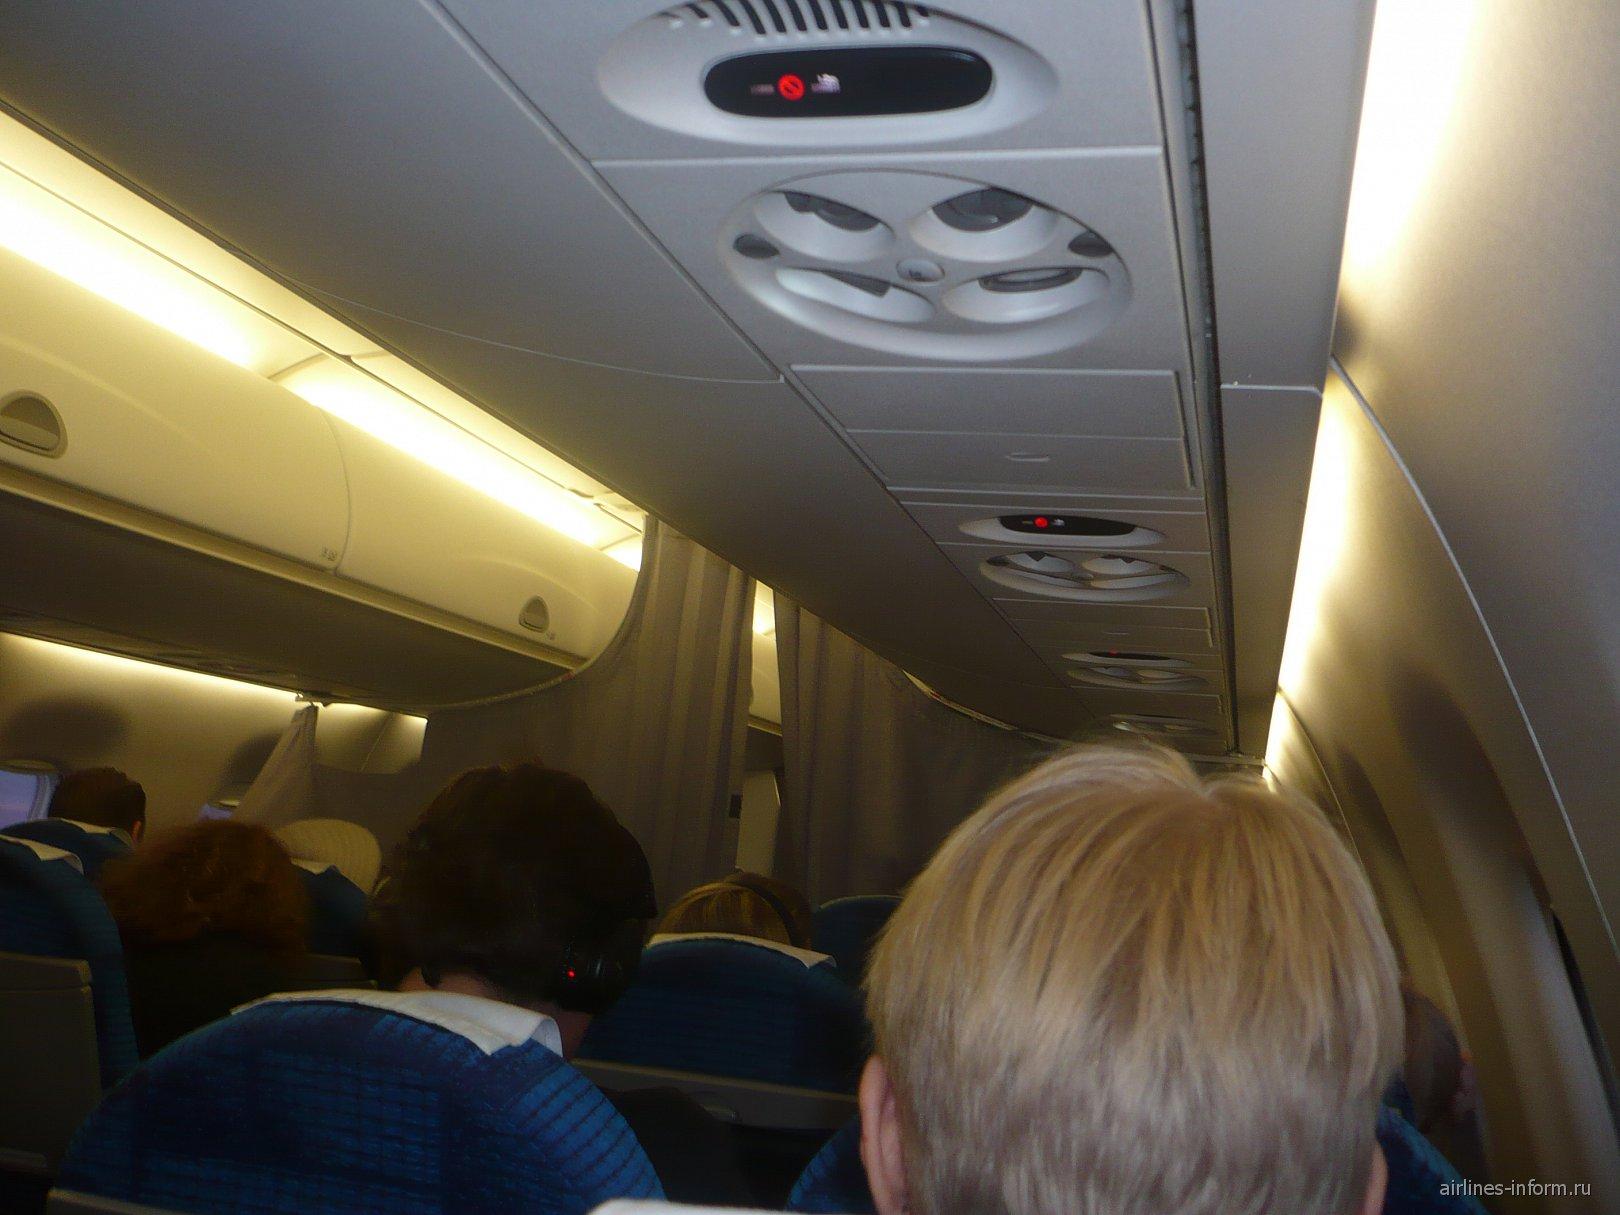 Салон самолета Embraer 170 авиакомпании Estonian Air